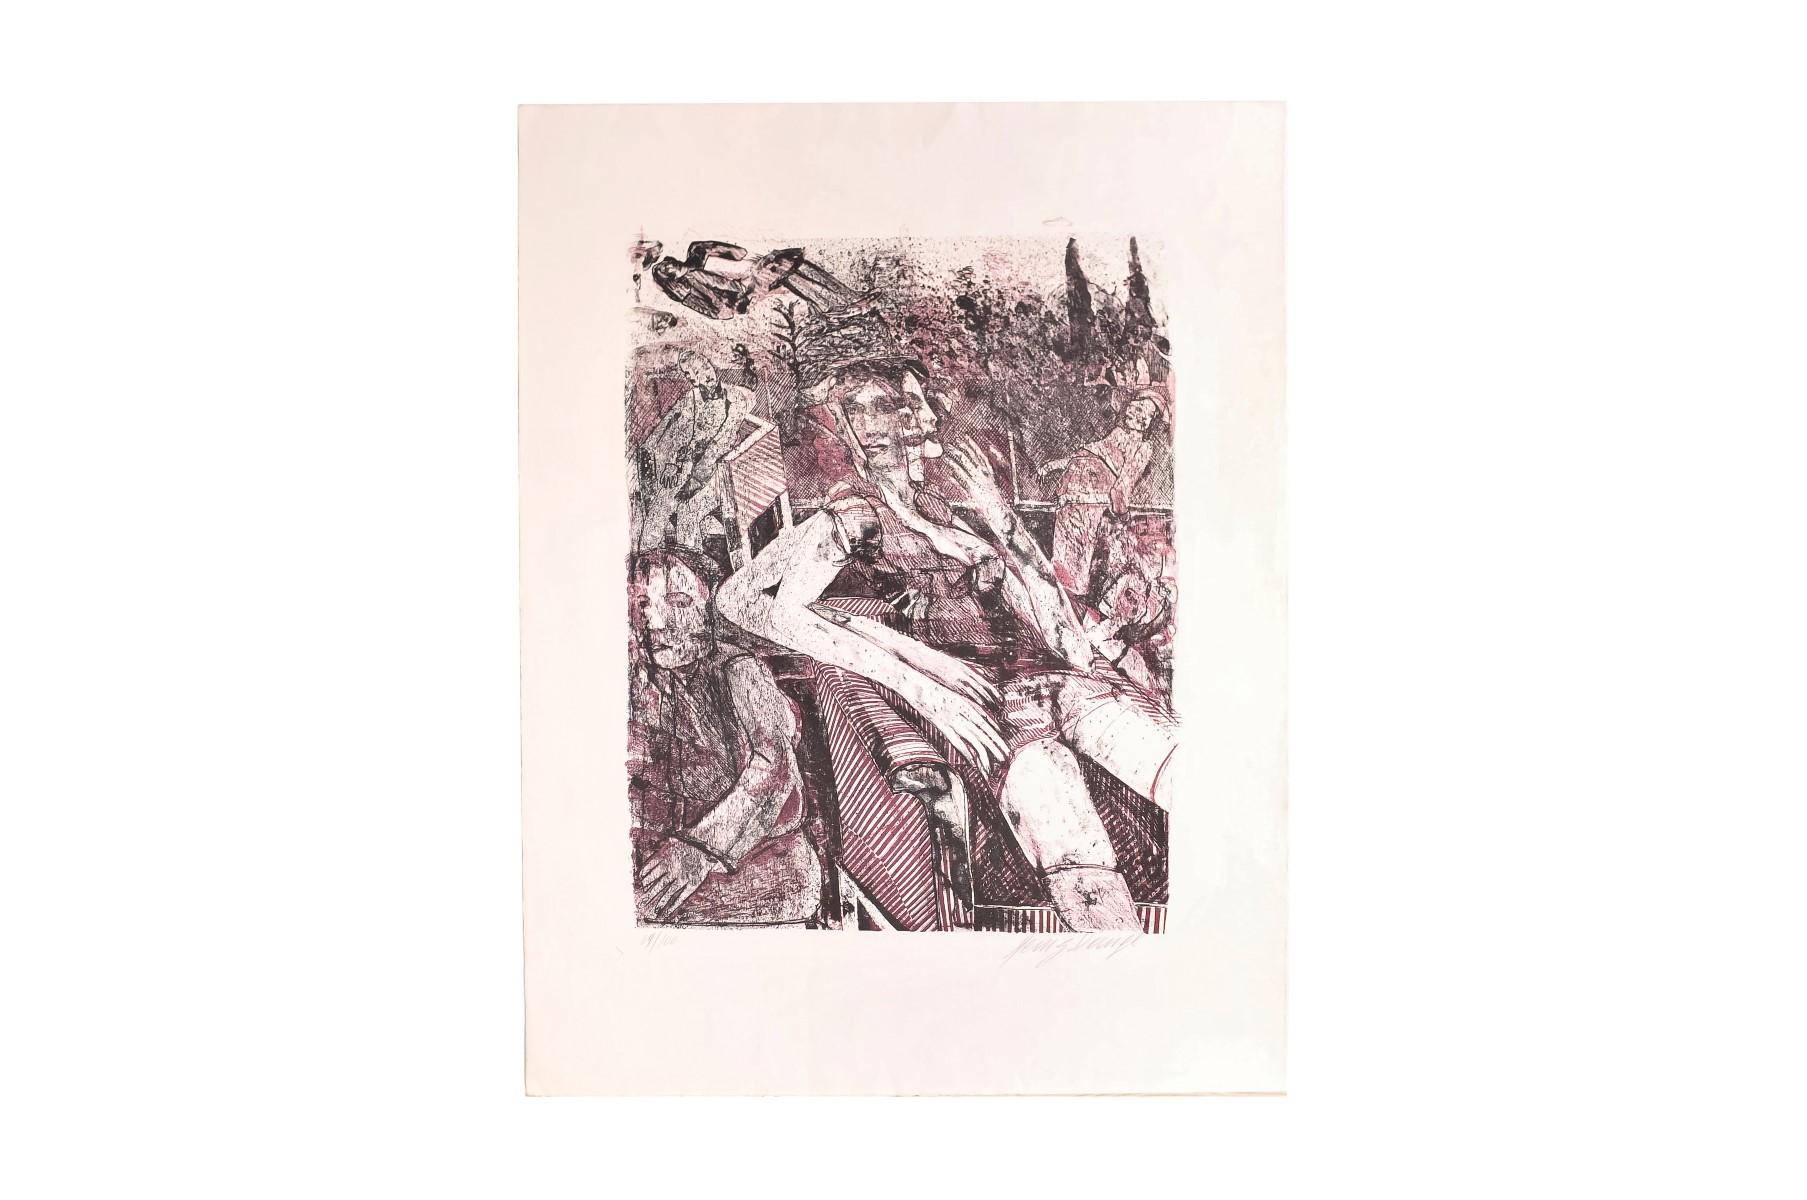 #11 Heinz Stangl* (1942-2008), Abstract Composition   Heinz Stangl* (1942-2008), Abstrakte Komposition Image